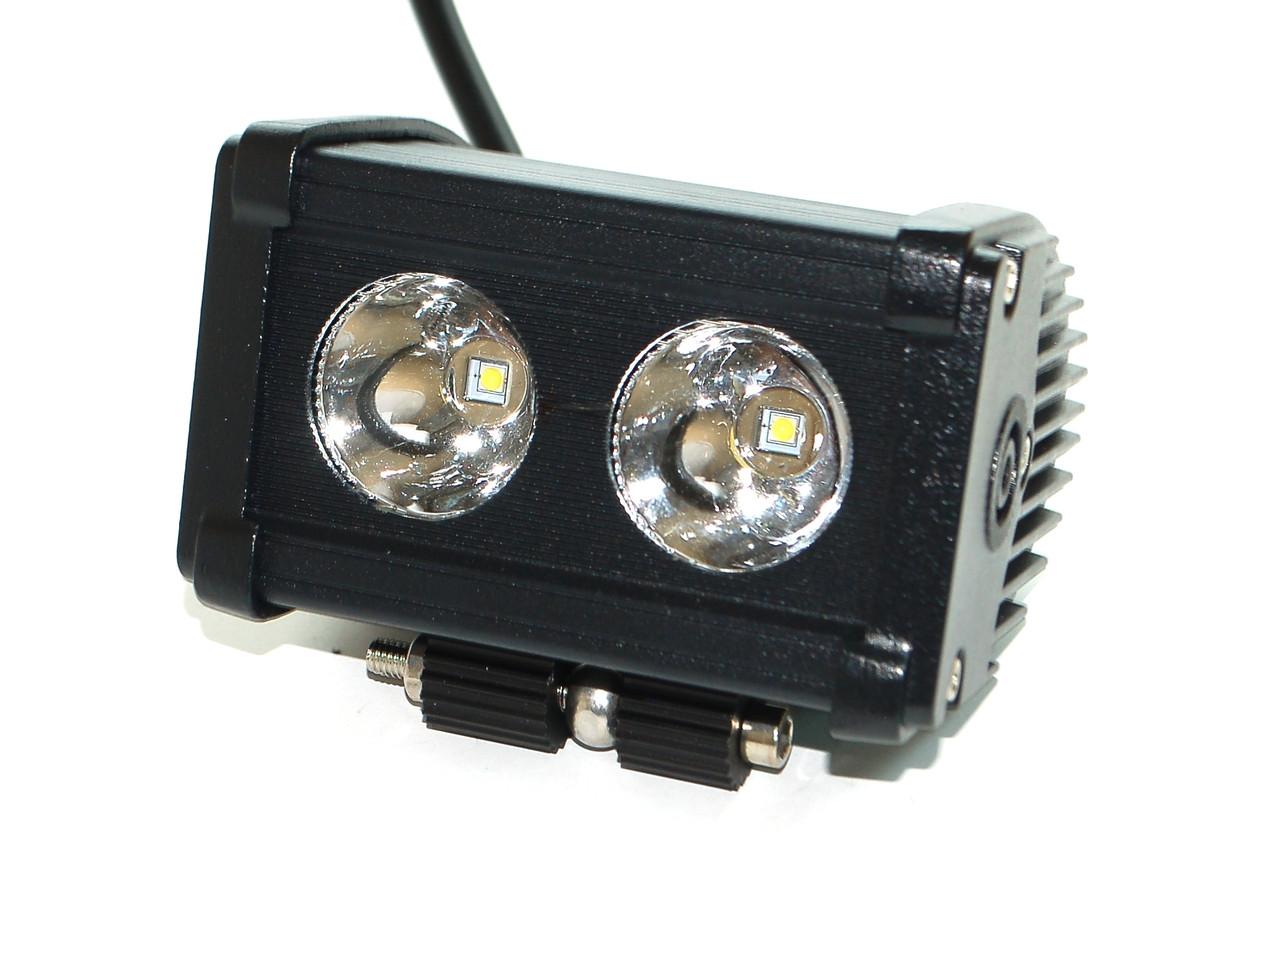 Светодиодная фара AllLight D-20W 2chip CREE spot 9-30V нижний крепеж